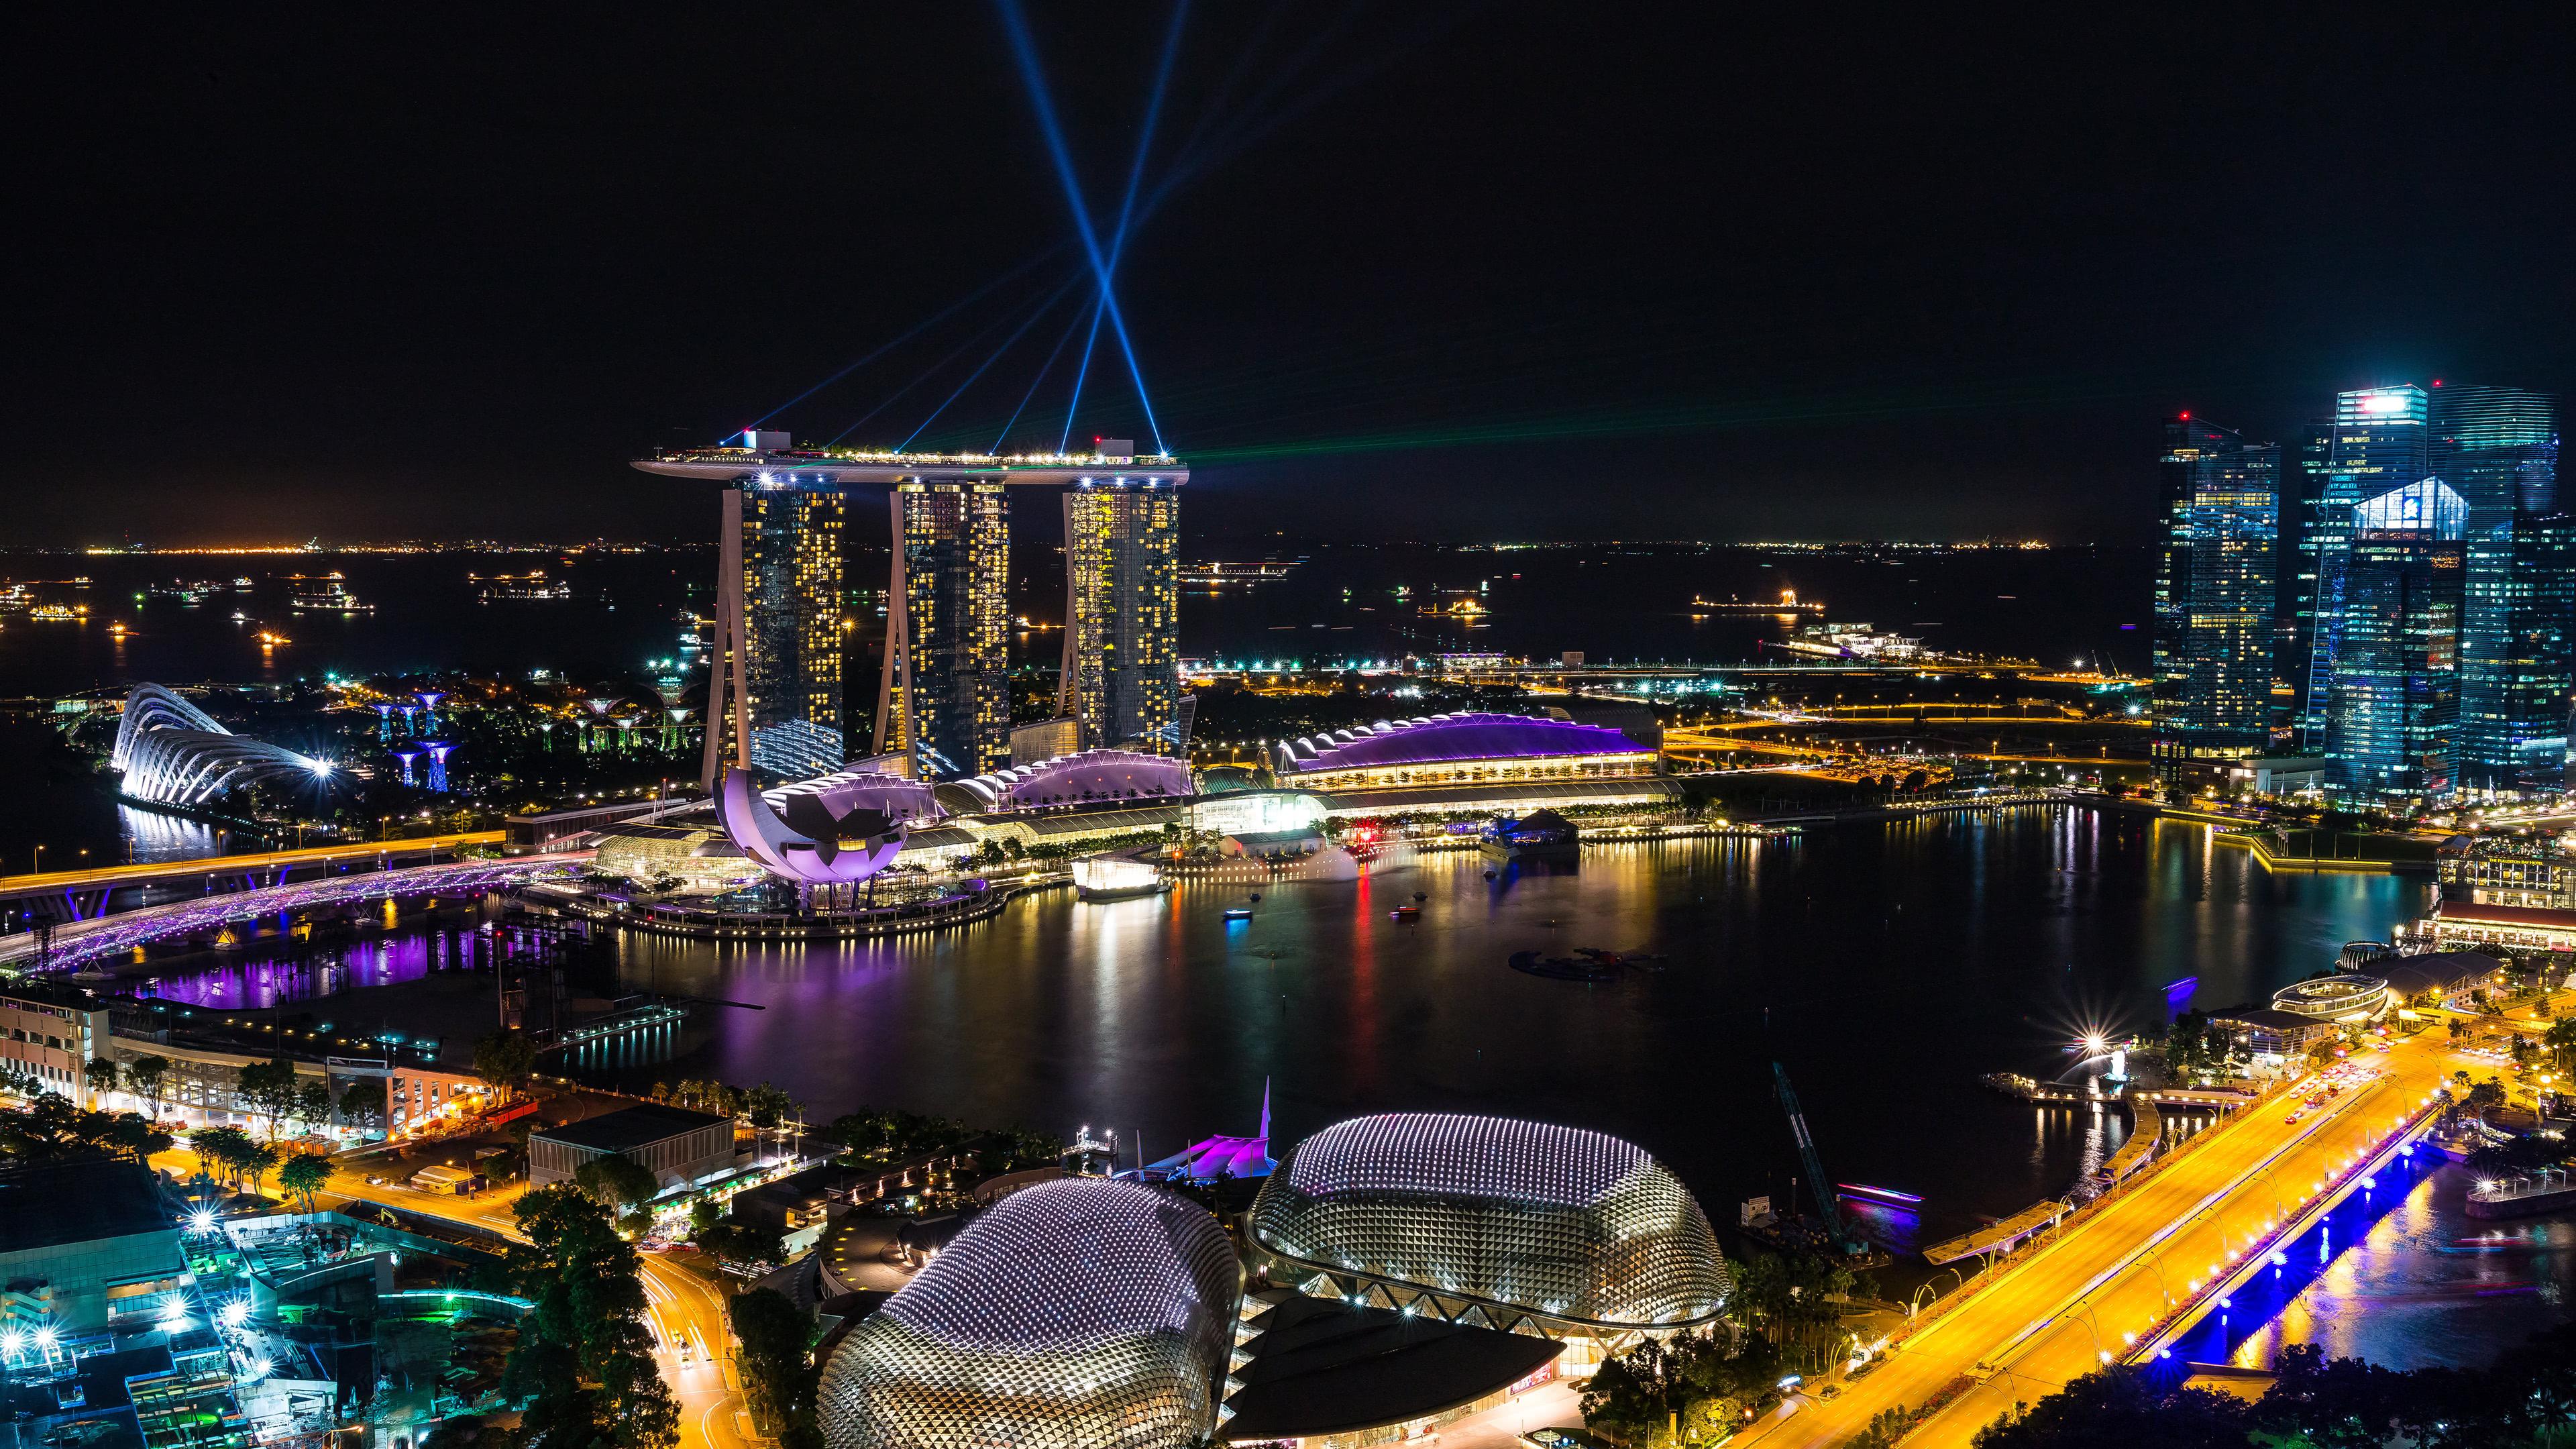 singapore marina bay night uhd 4k wallpaper